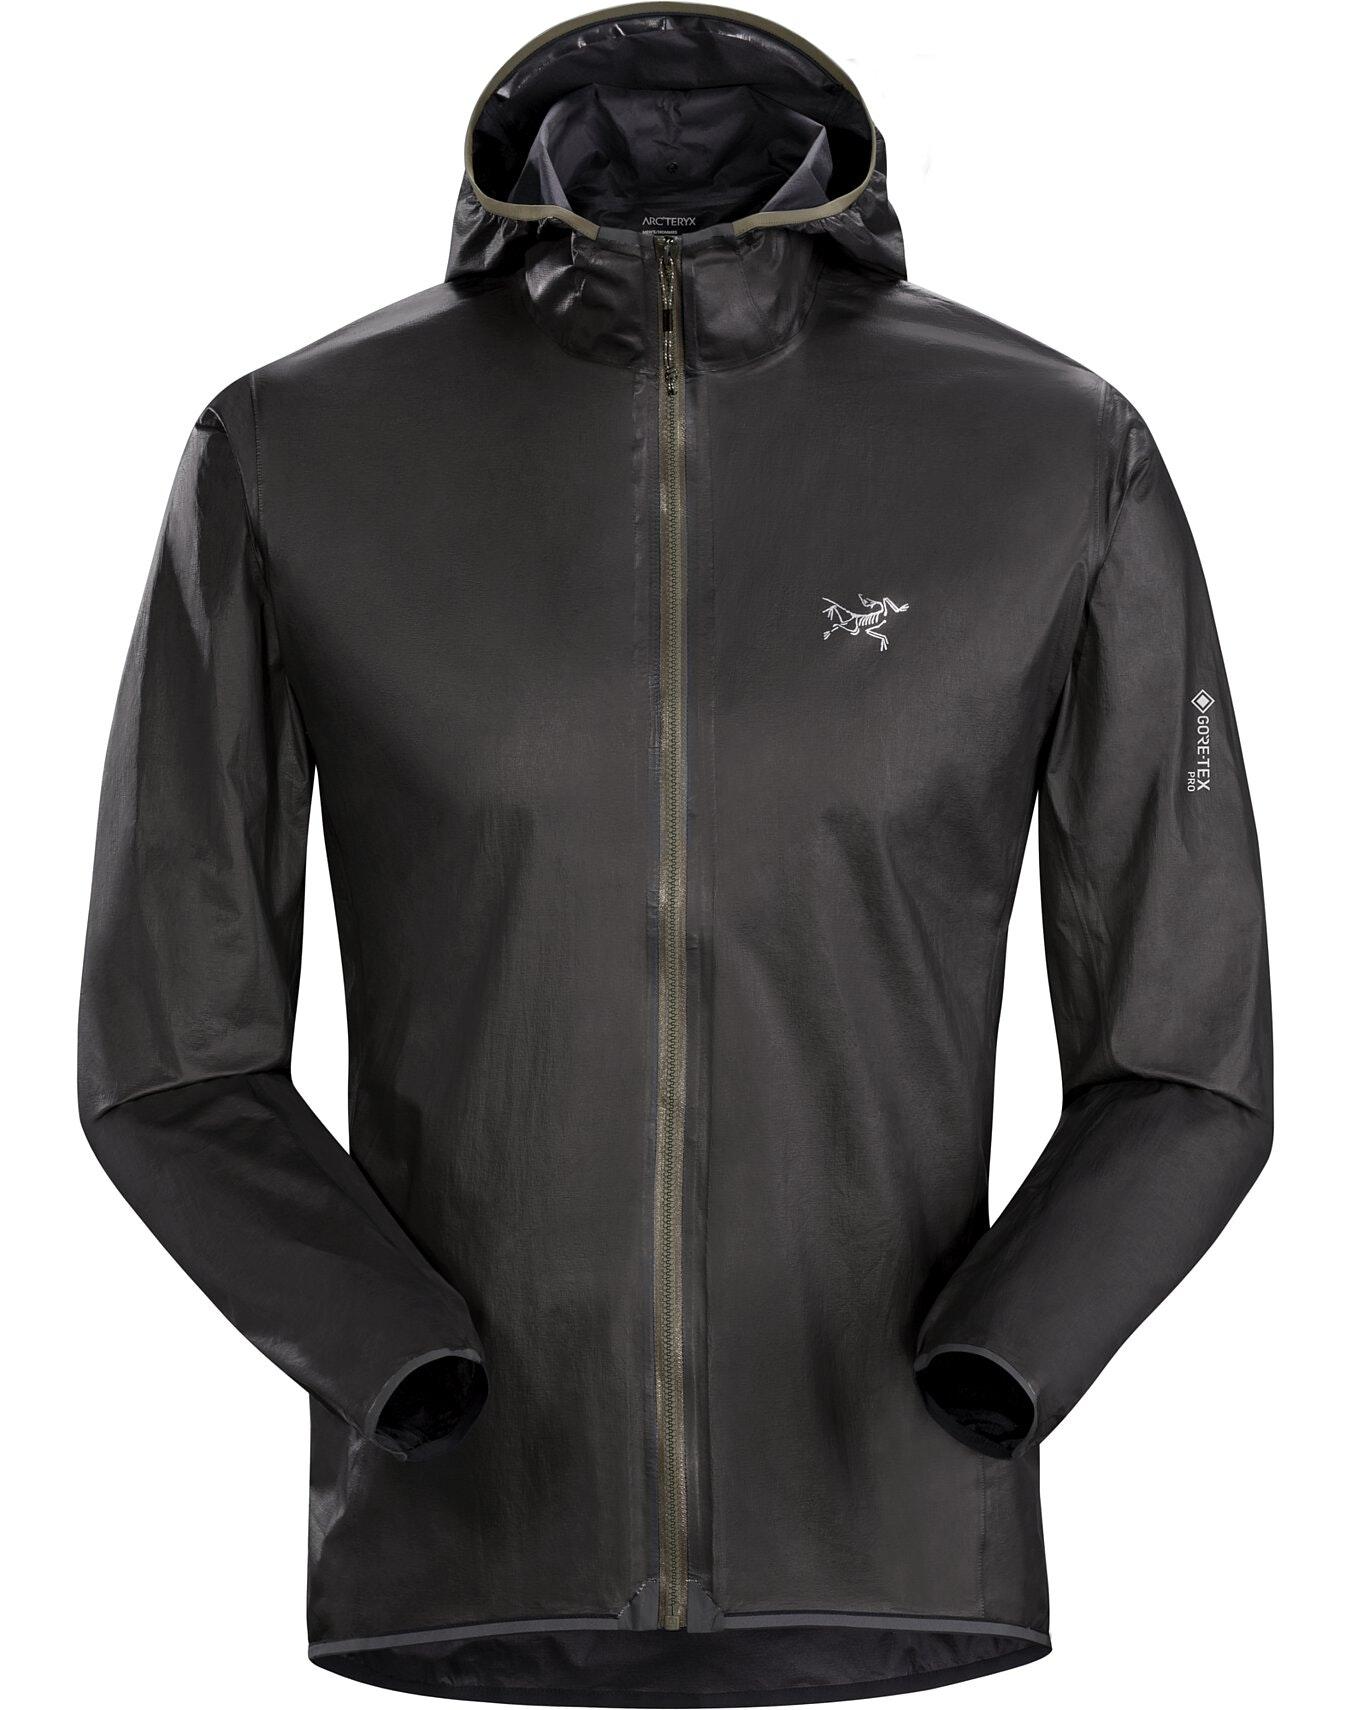 Norvan SL Hoody Black/Aeroponic